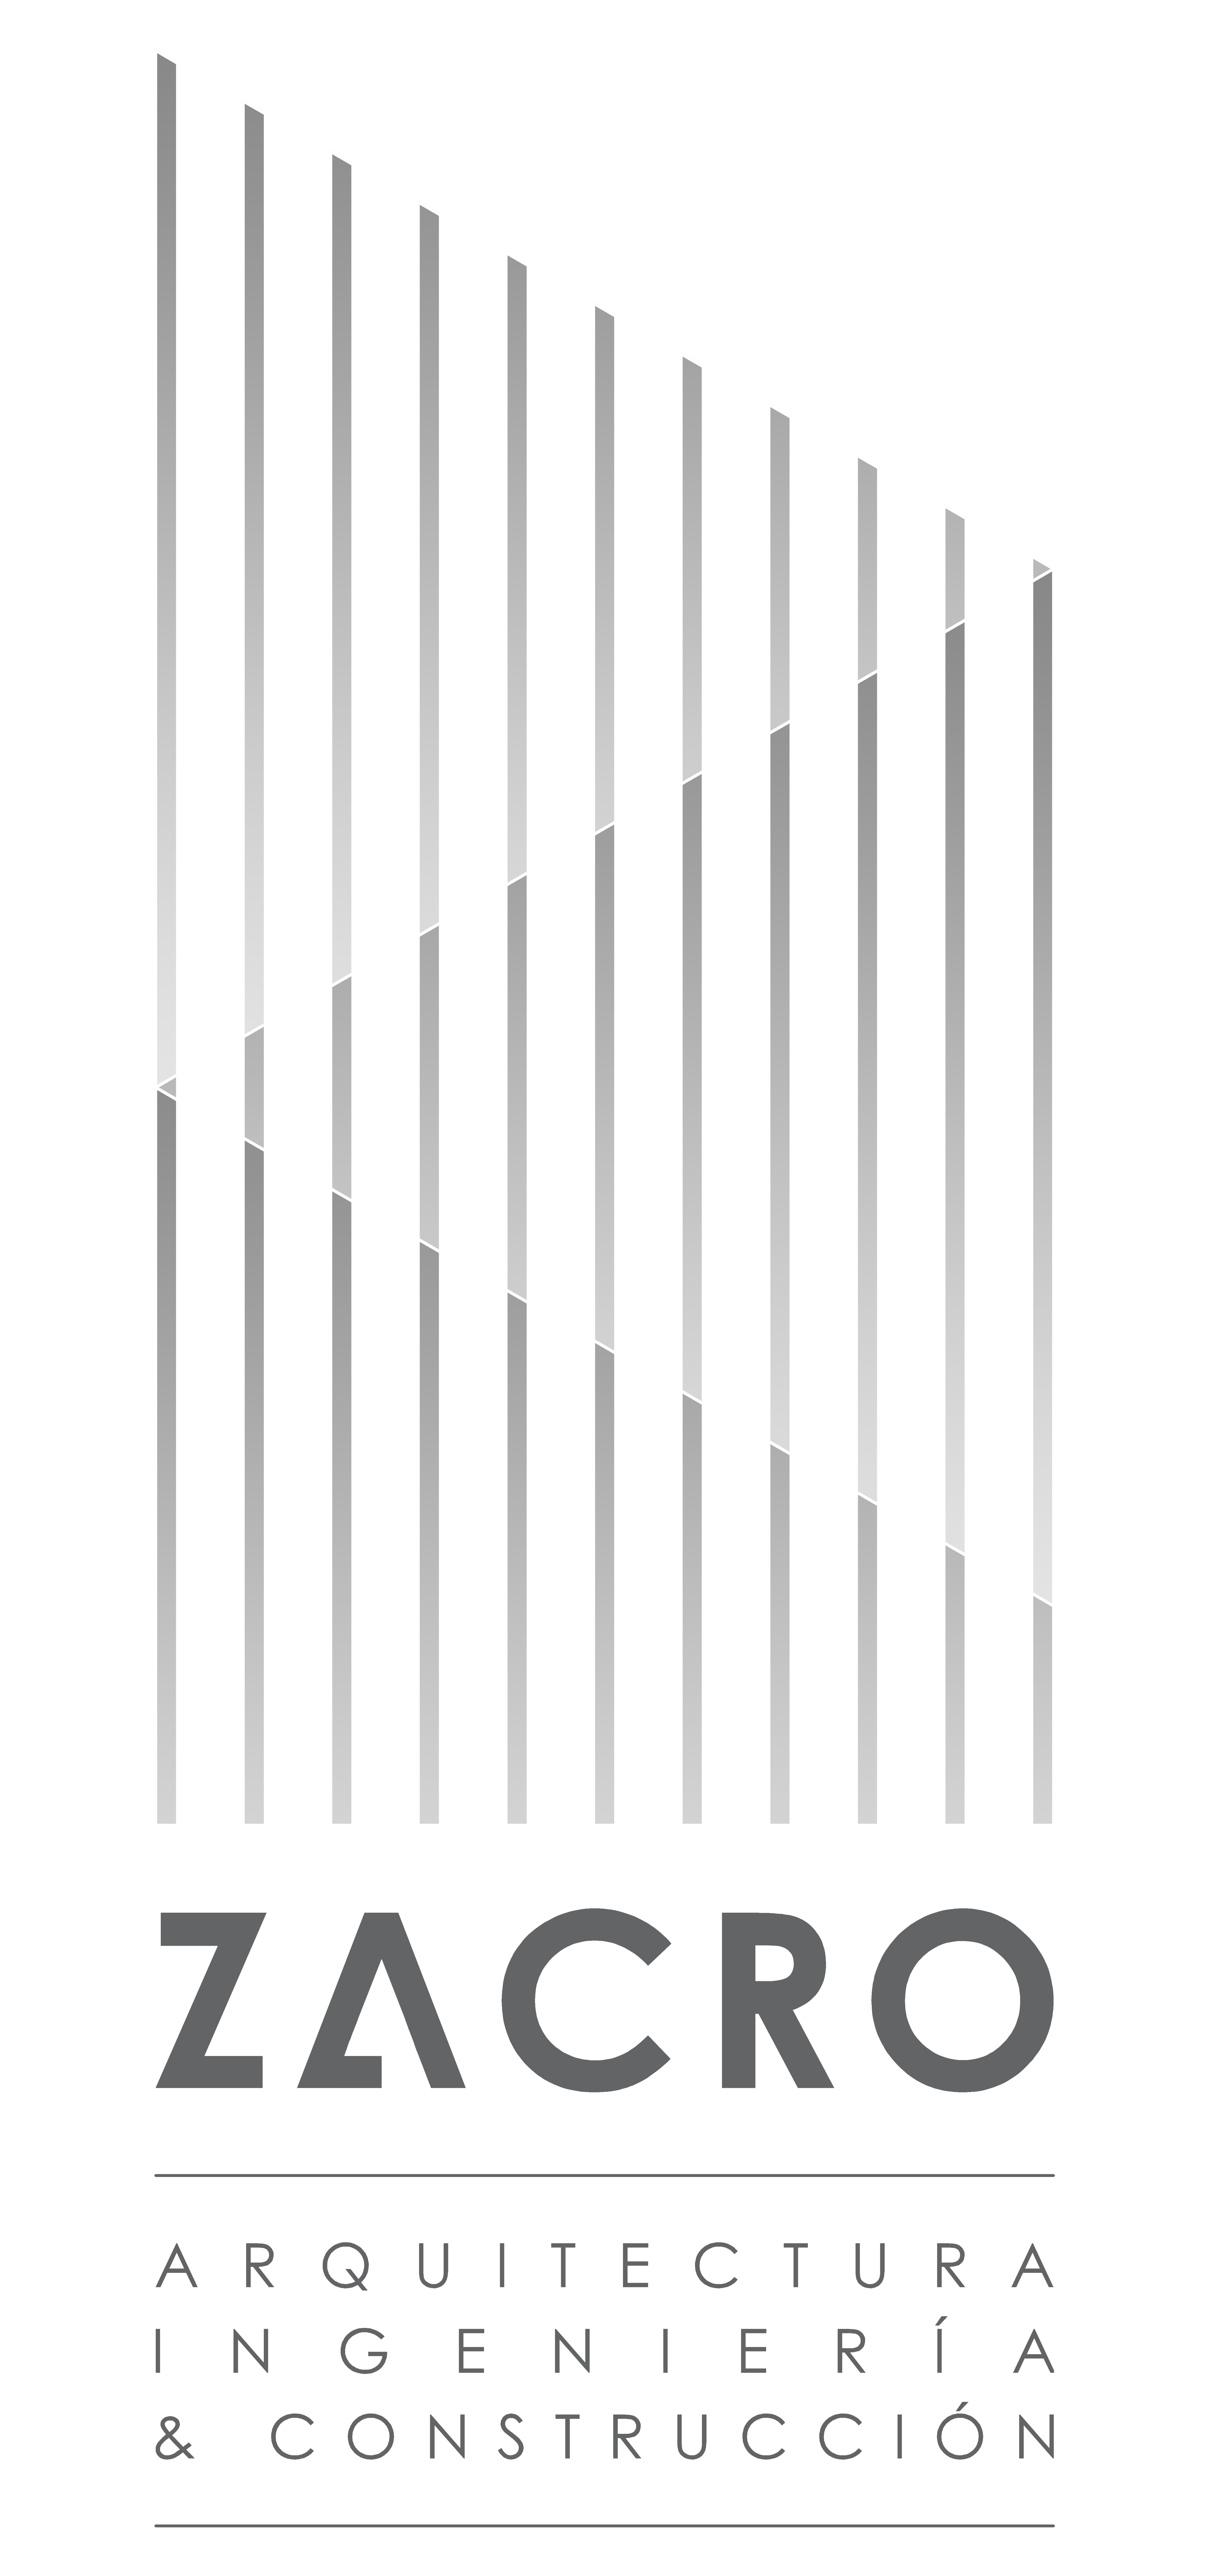 Zacro Arquitectura